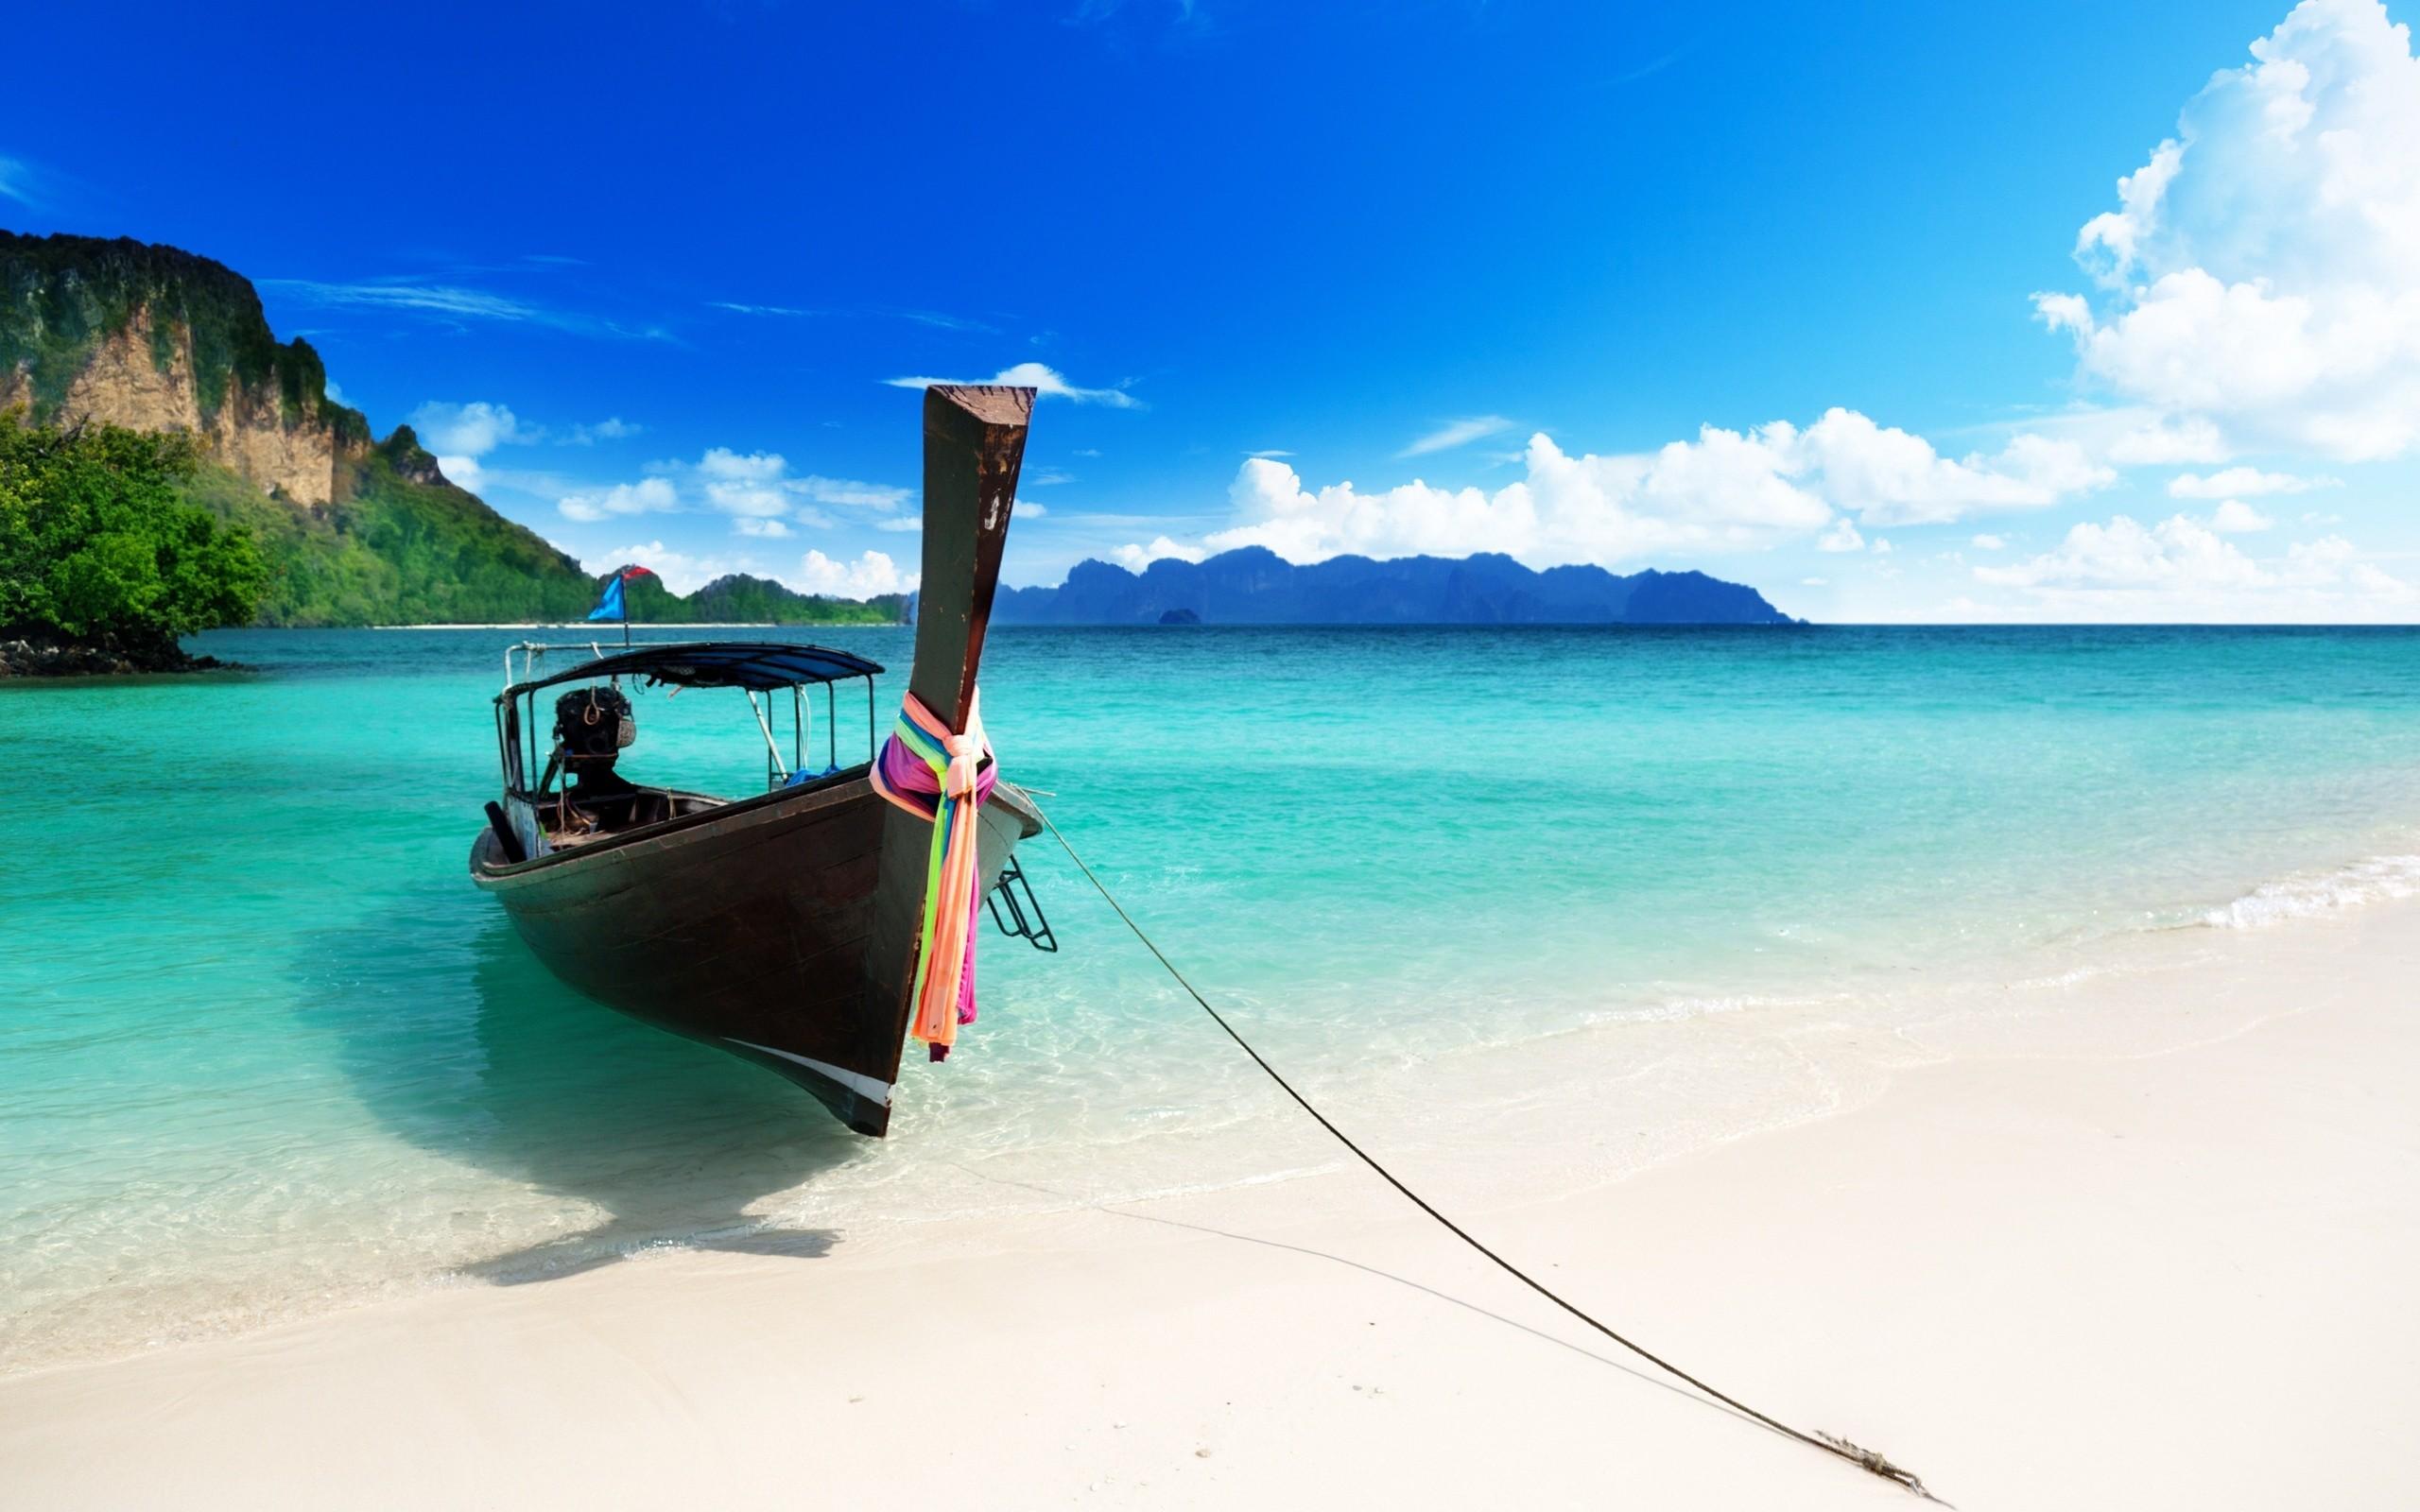 Boat-ocean-wallpapers-HD-desktop